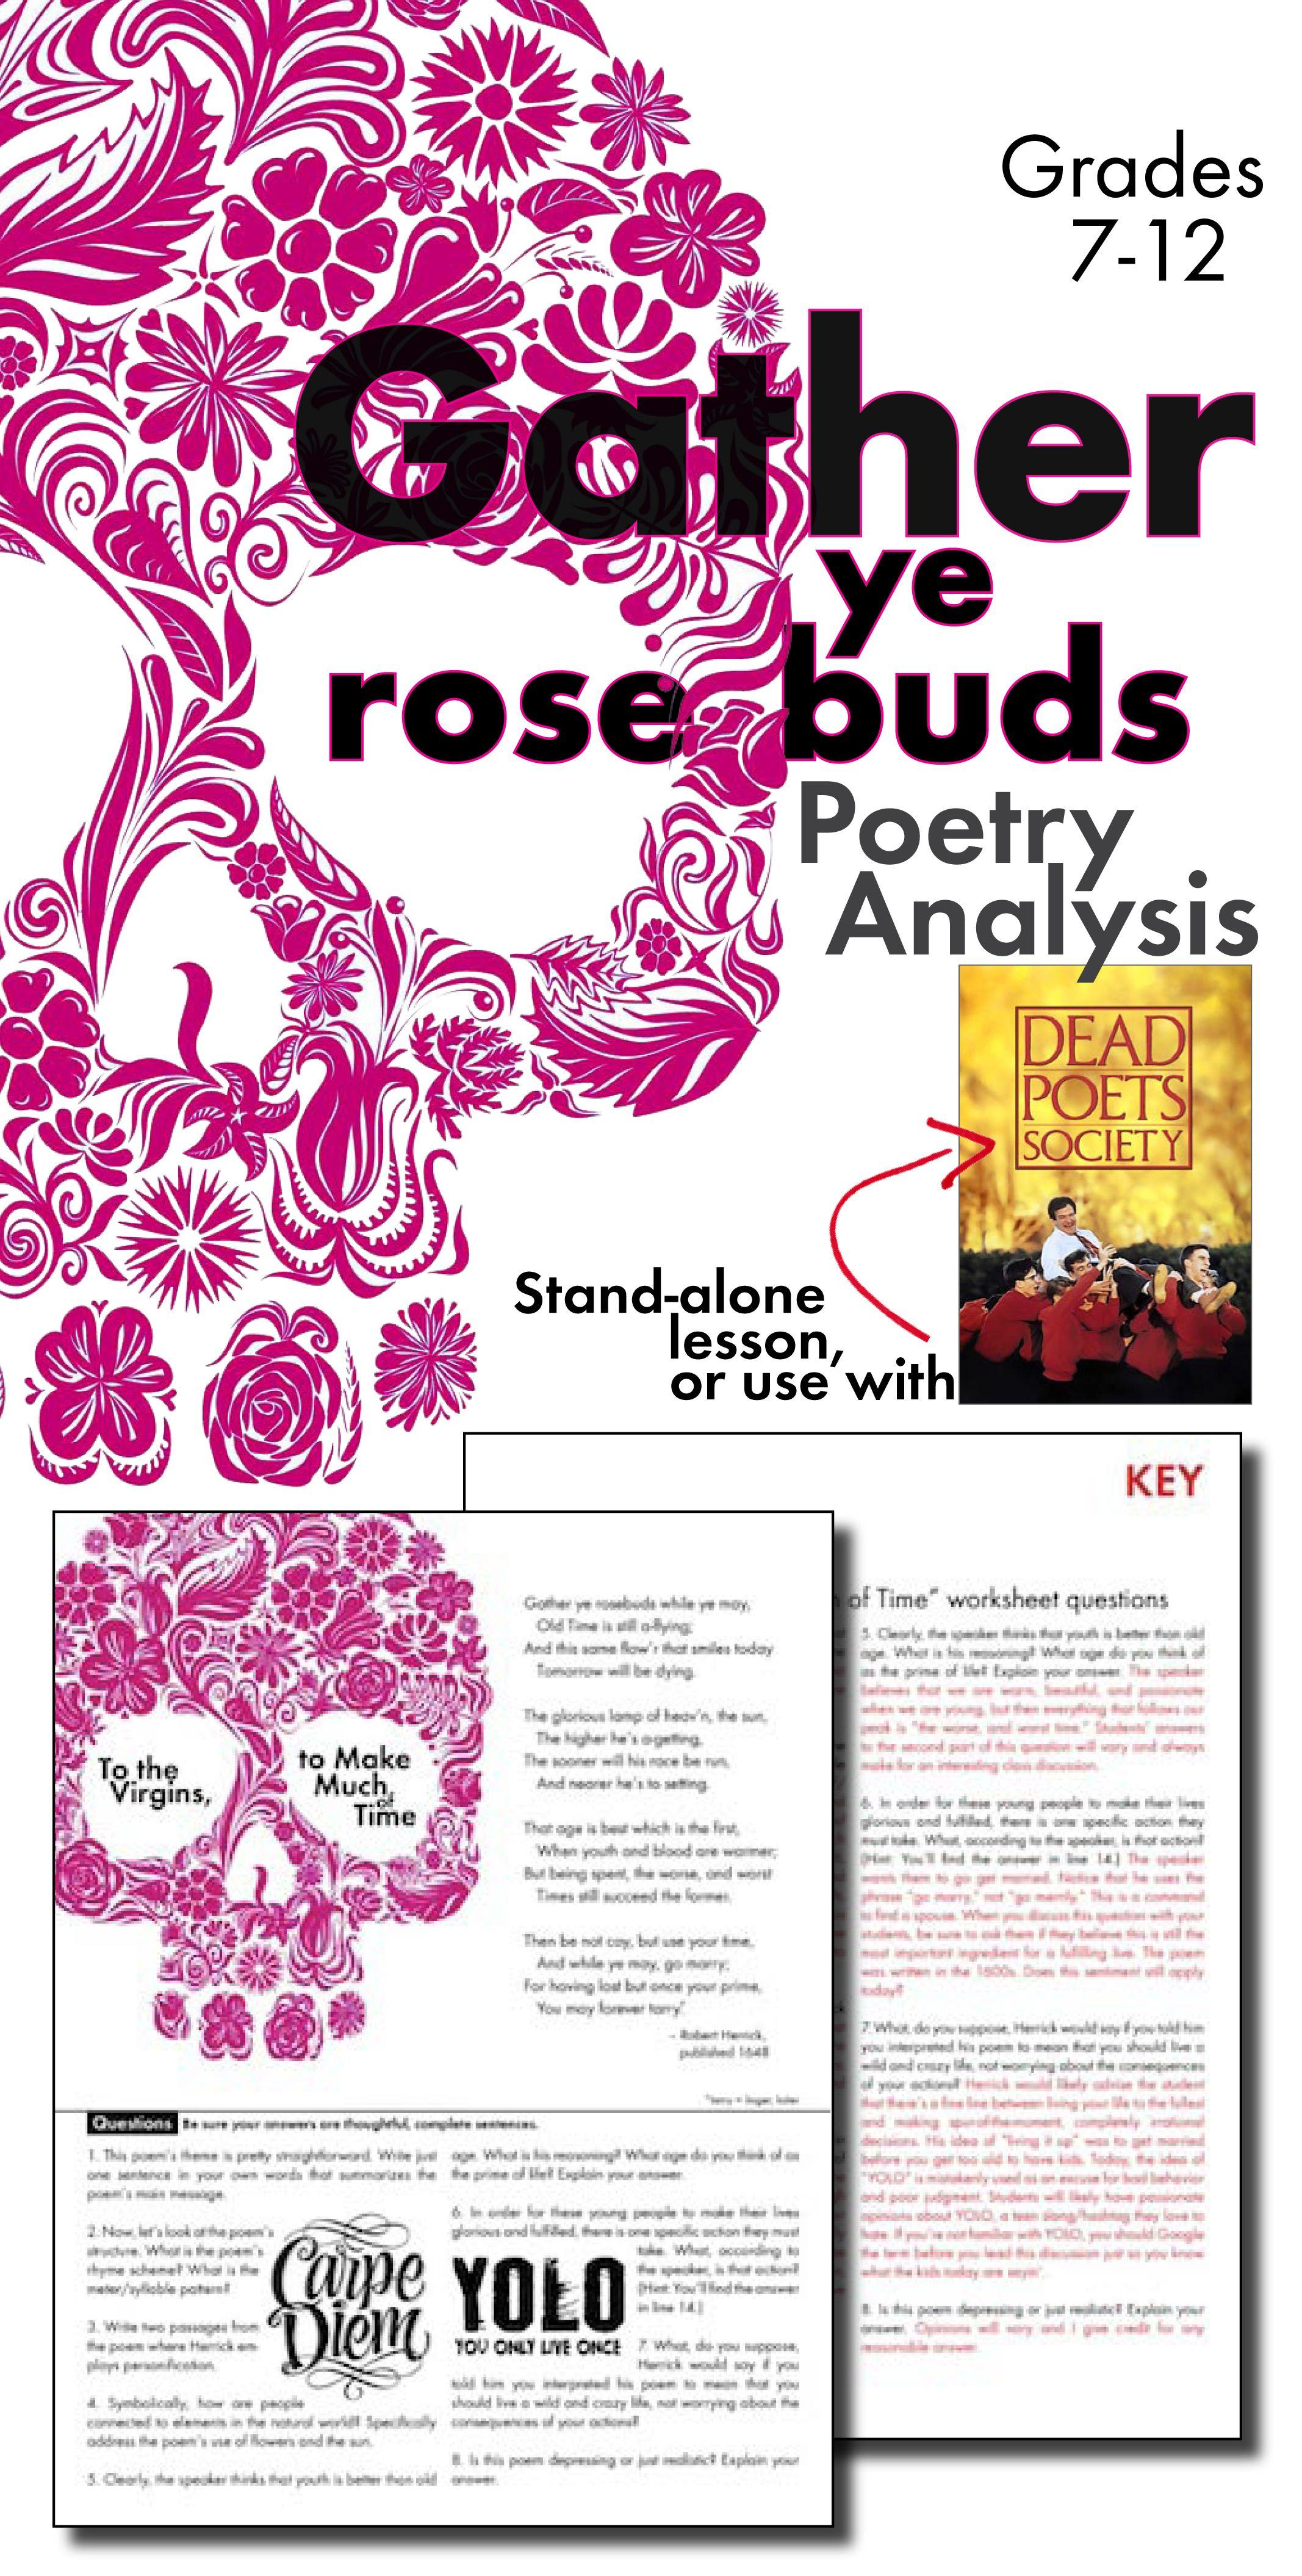 Gather Ye Rosebuds Poetryysis Worksheet For Robert Herrick S Poem